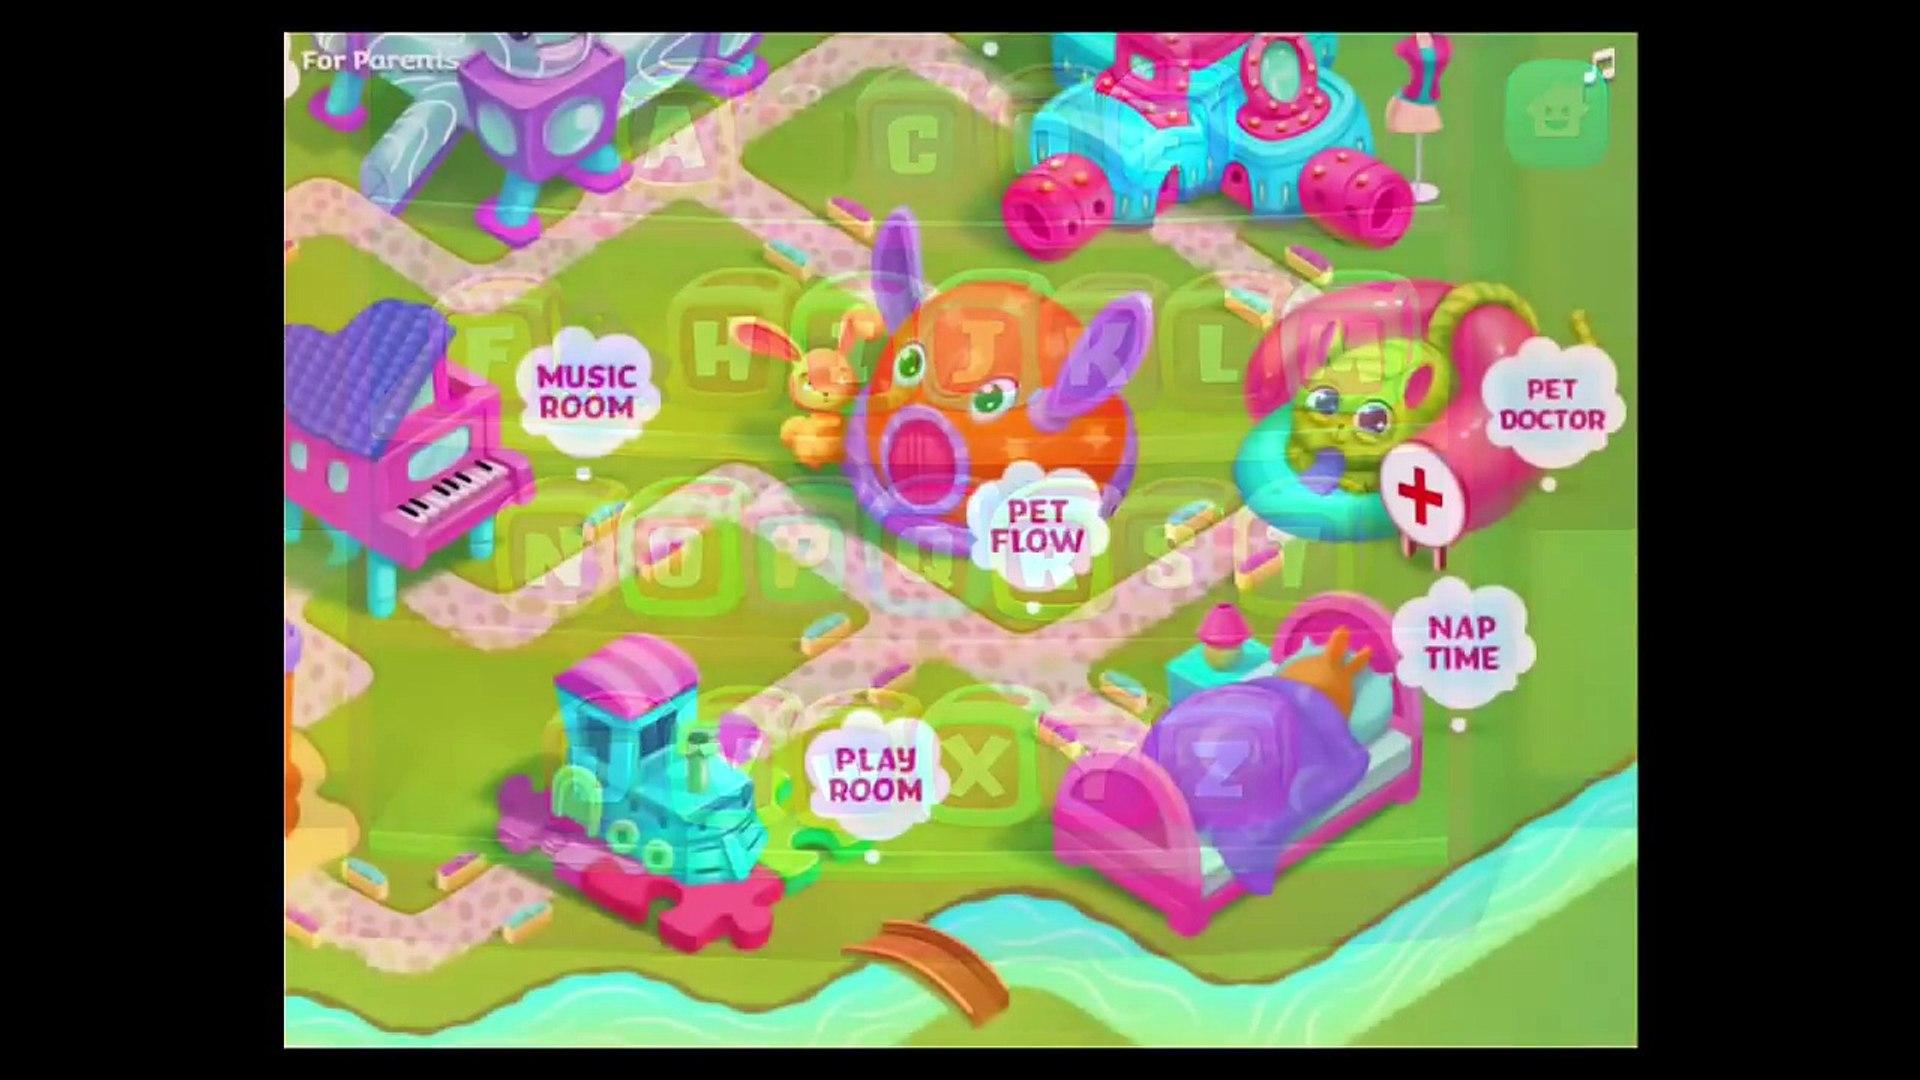 Best Games for Kids HD - Kids Play Club - Fun Games & Activities iPad Gameplay HD